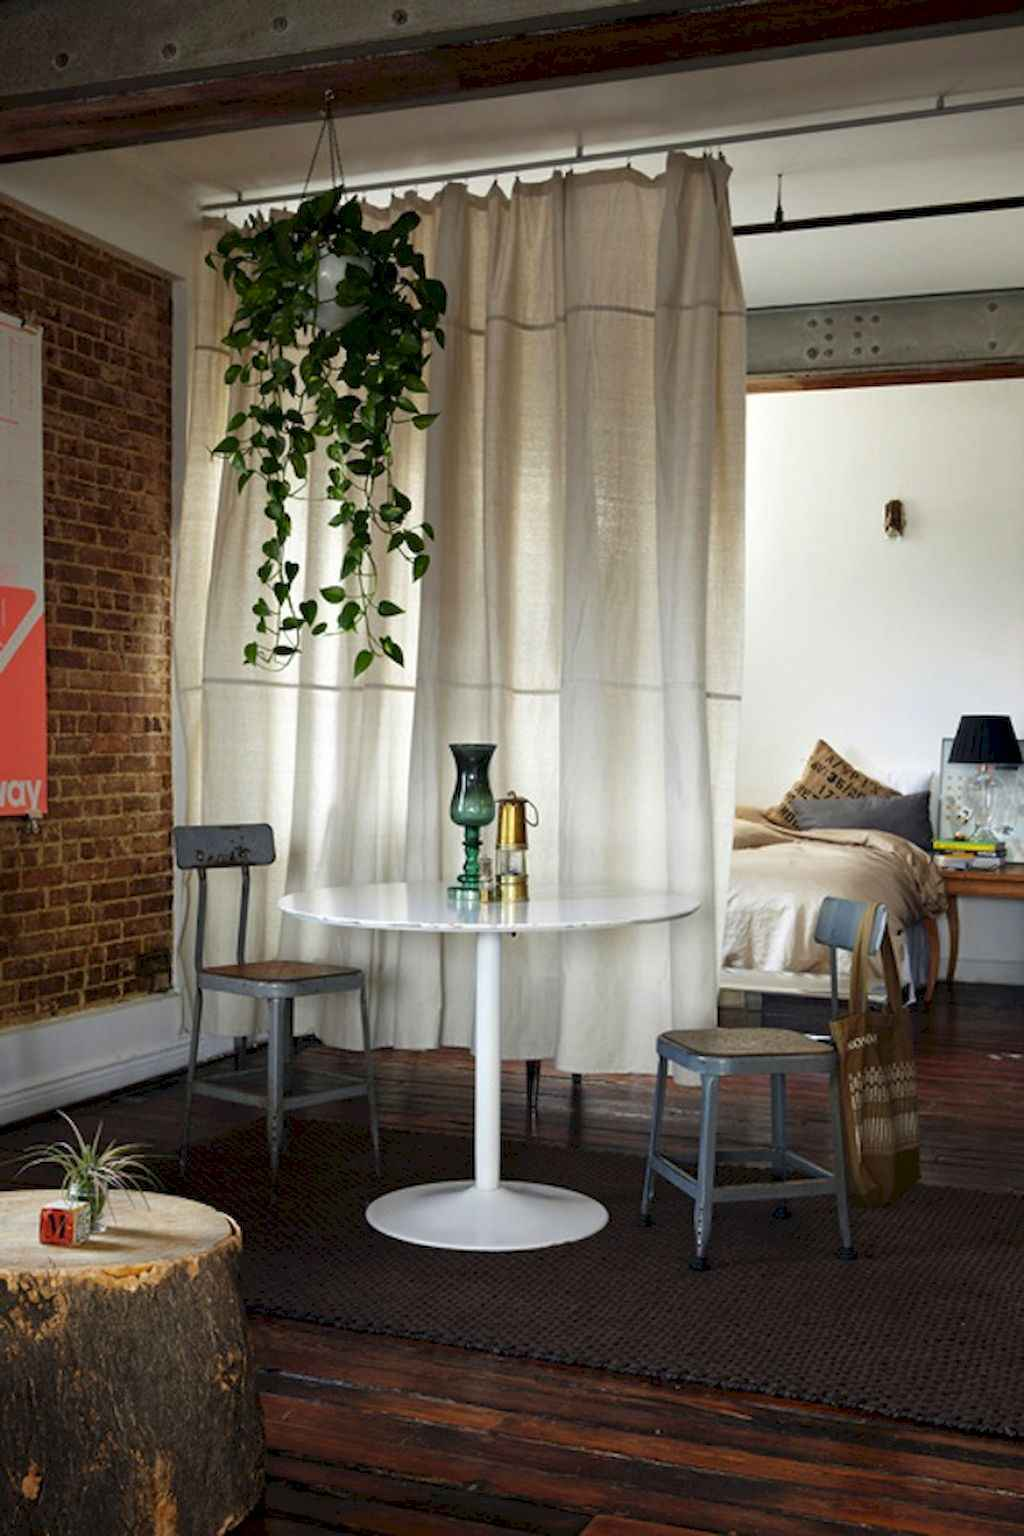 Small apartment decorating ideas (17)